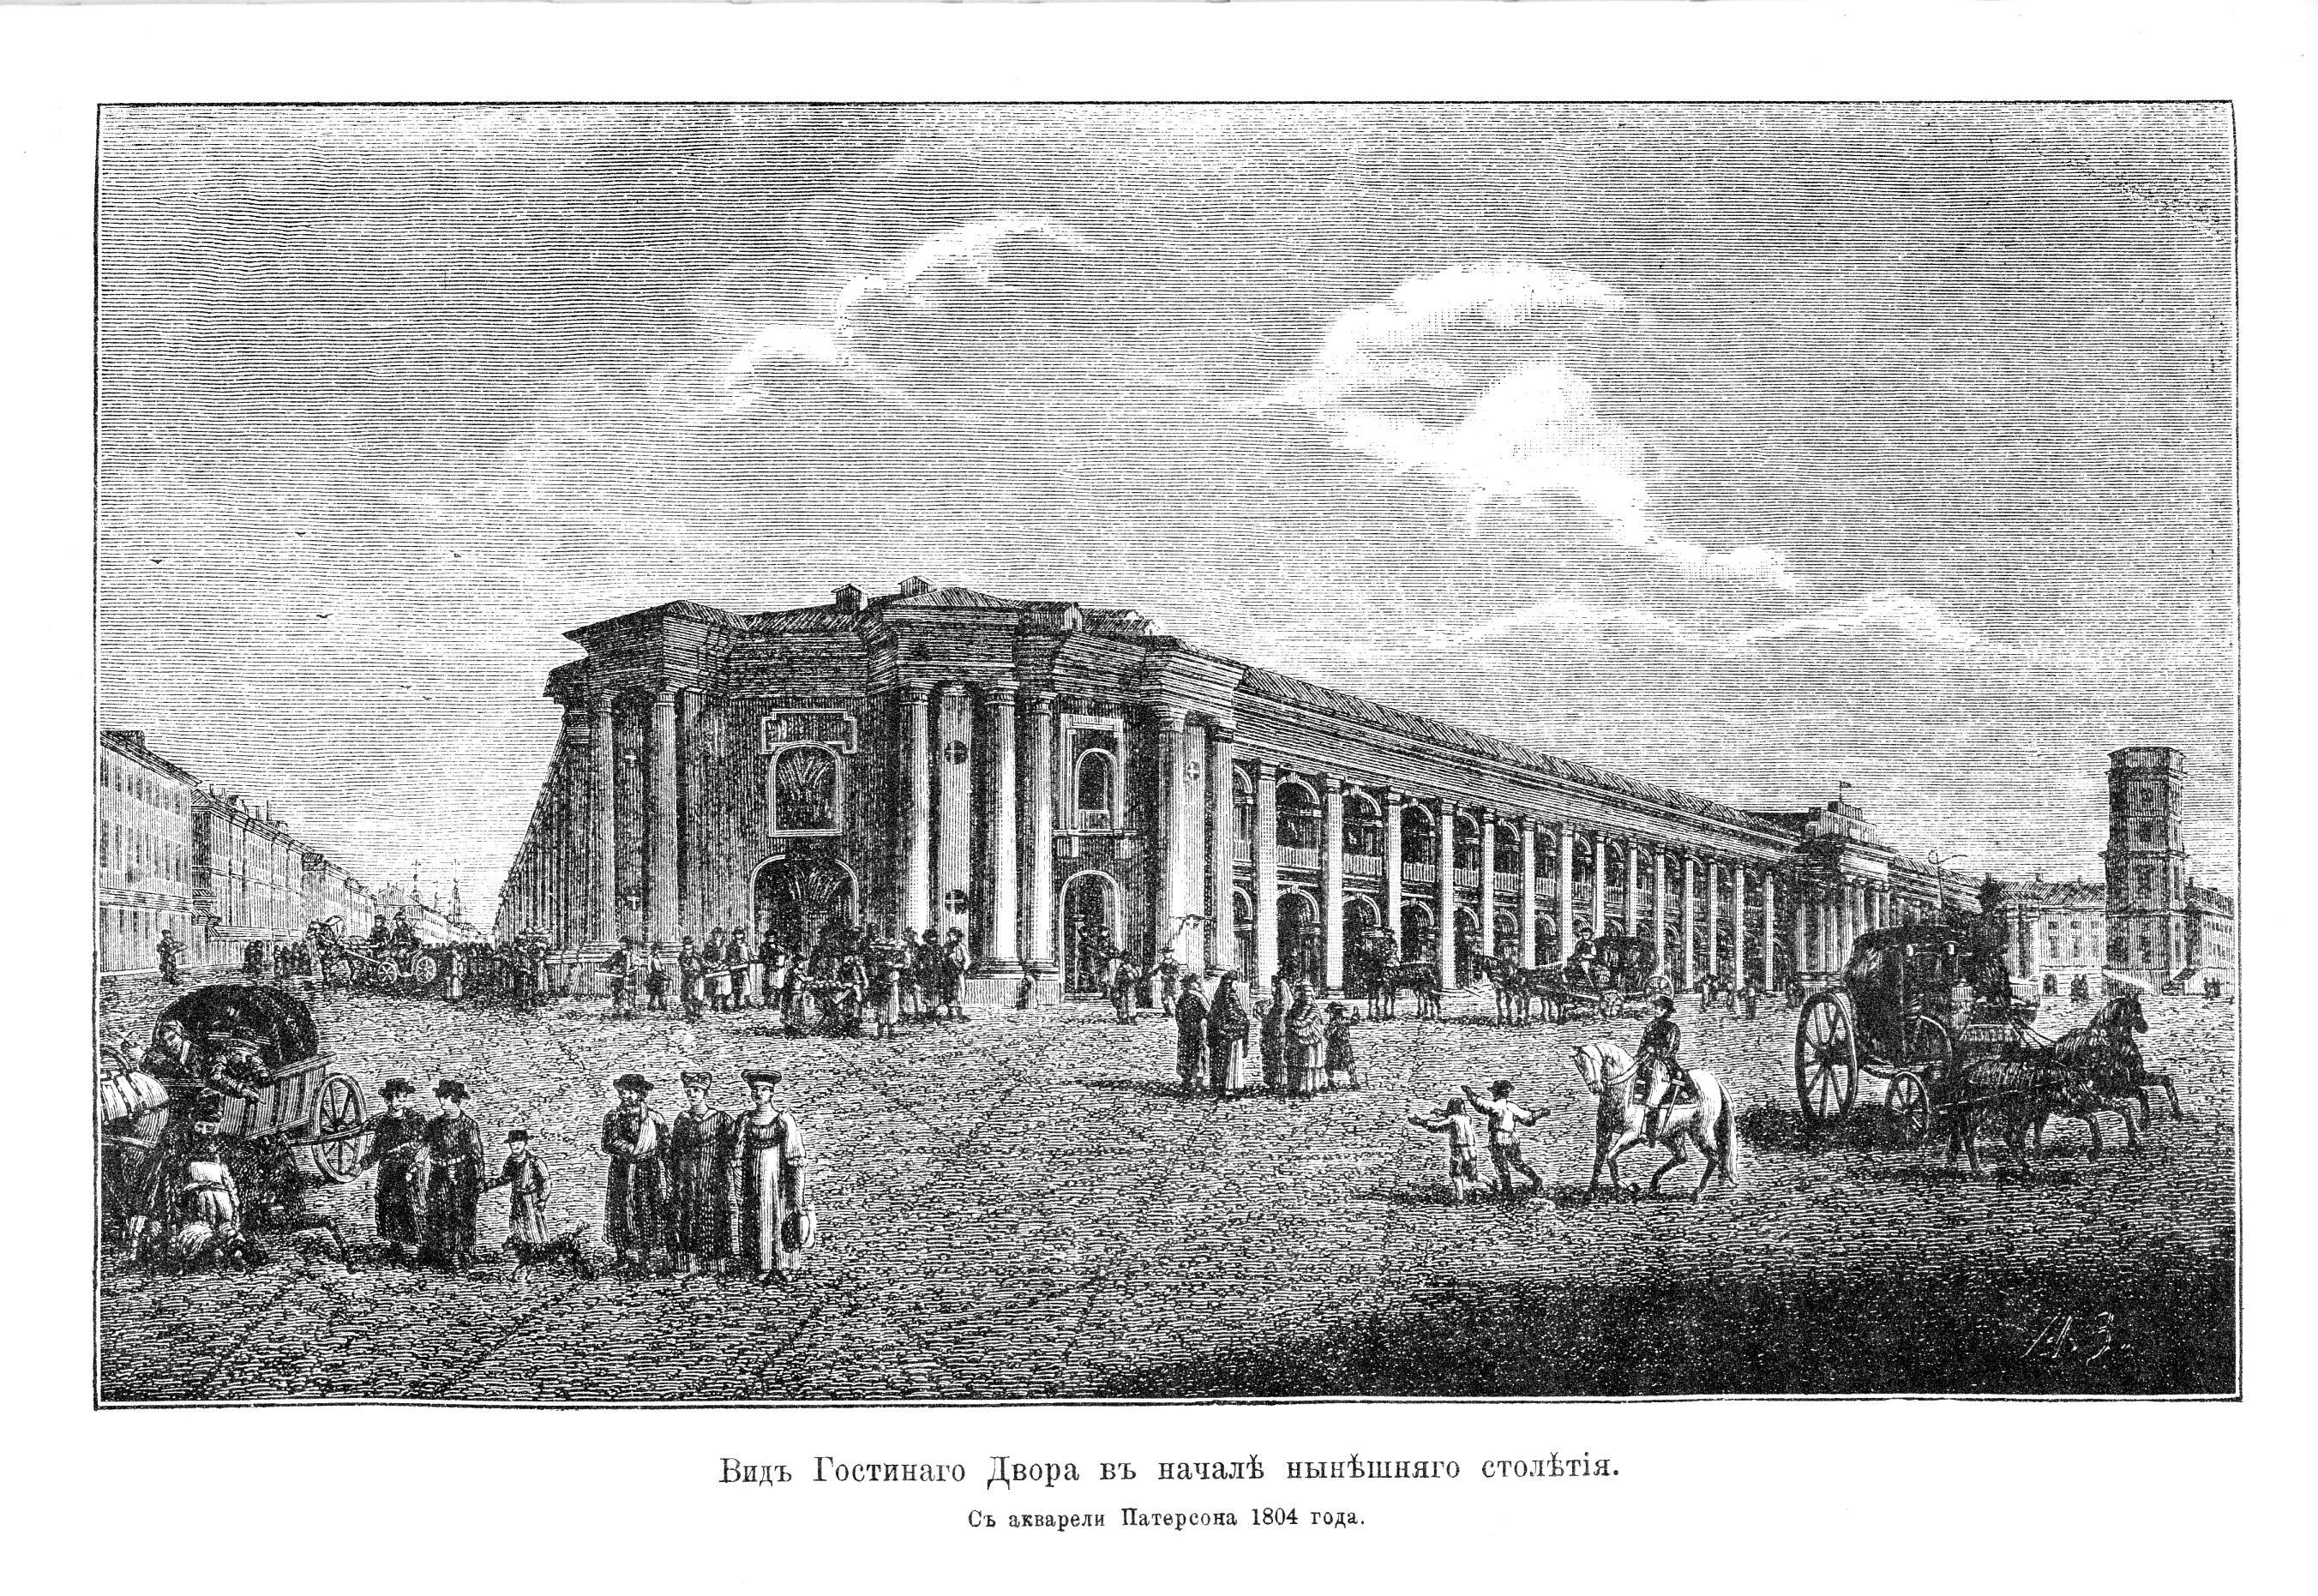 Вид Гостиного двора